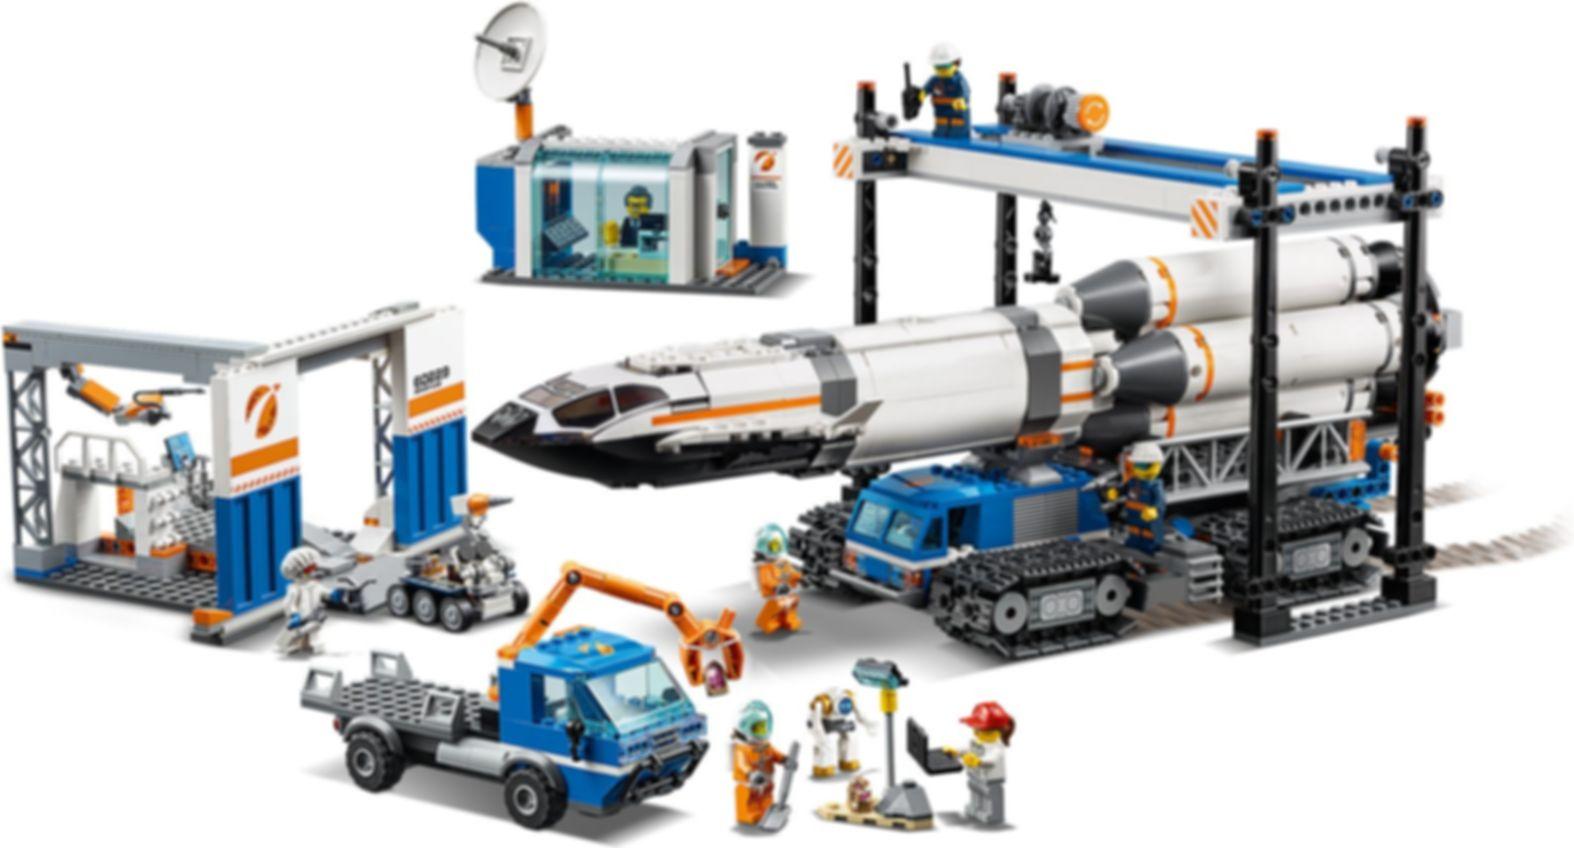 LEGO® City Rocket Assembly & Transport gameplay